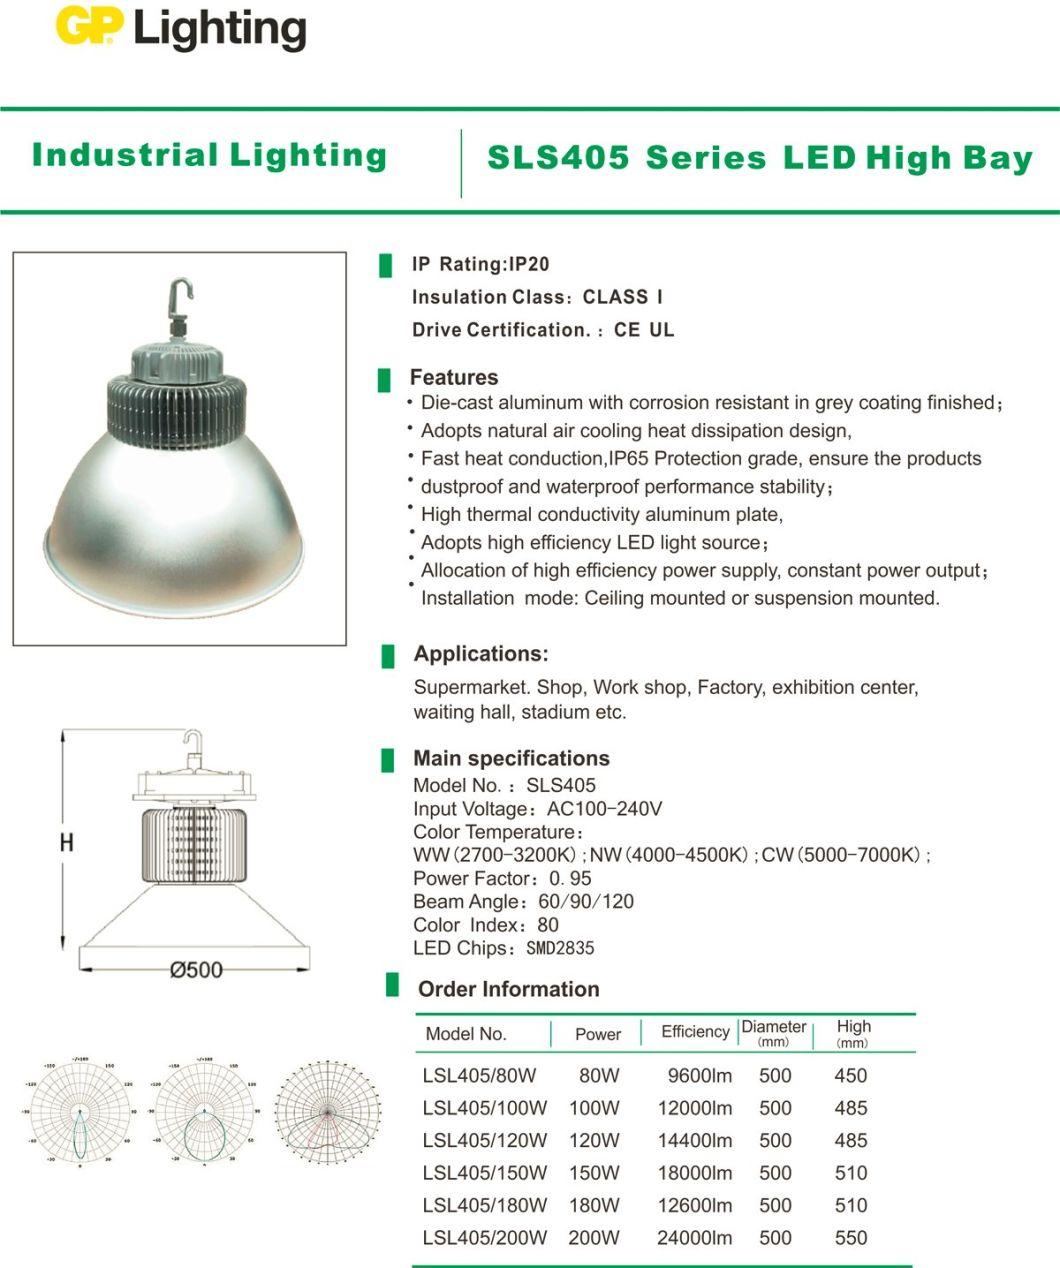 200W High Energy LED Highbay Light for Industrial/Factory/Warehouse Lighting (SLS405)